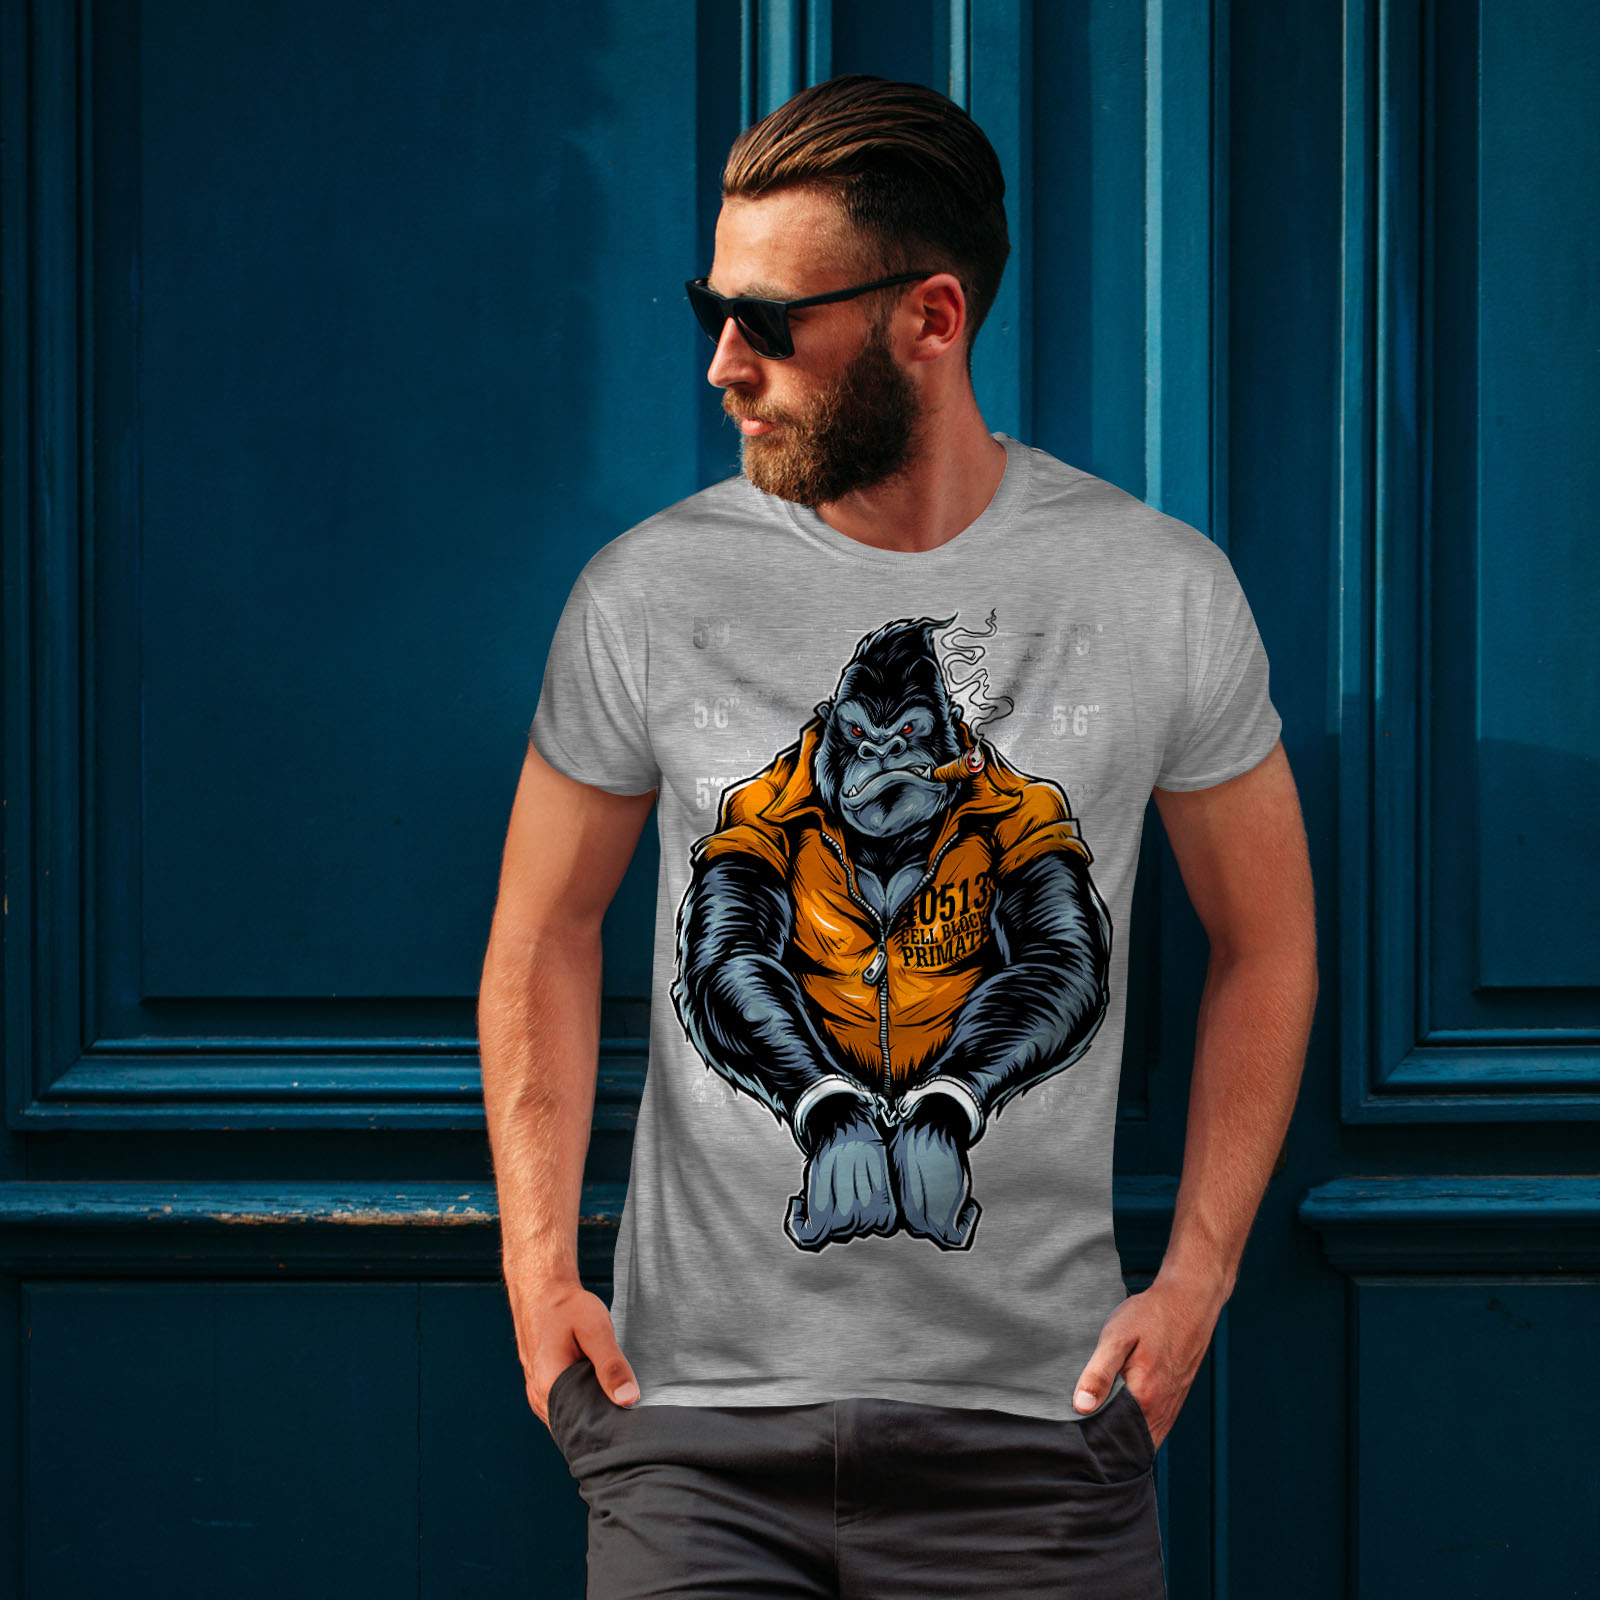 Wellcoda-Monkey-Ape-Prison-Mens-T-shirt-Wild-Graphic-Design-Printed-Tee thumbnail 16